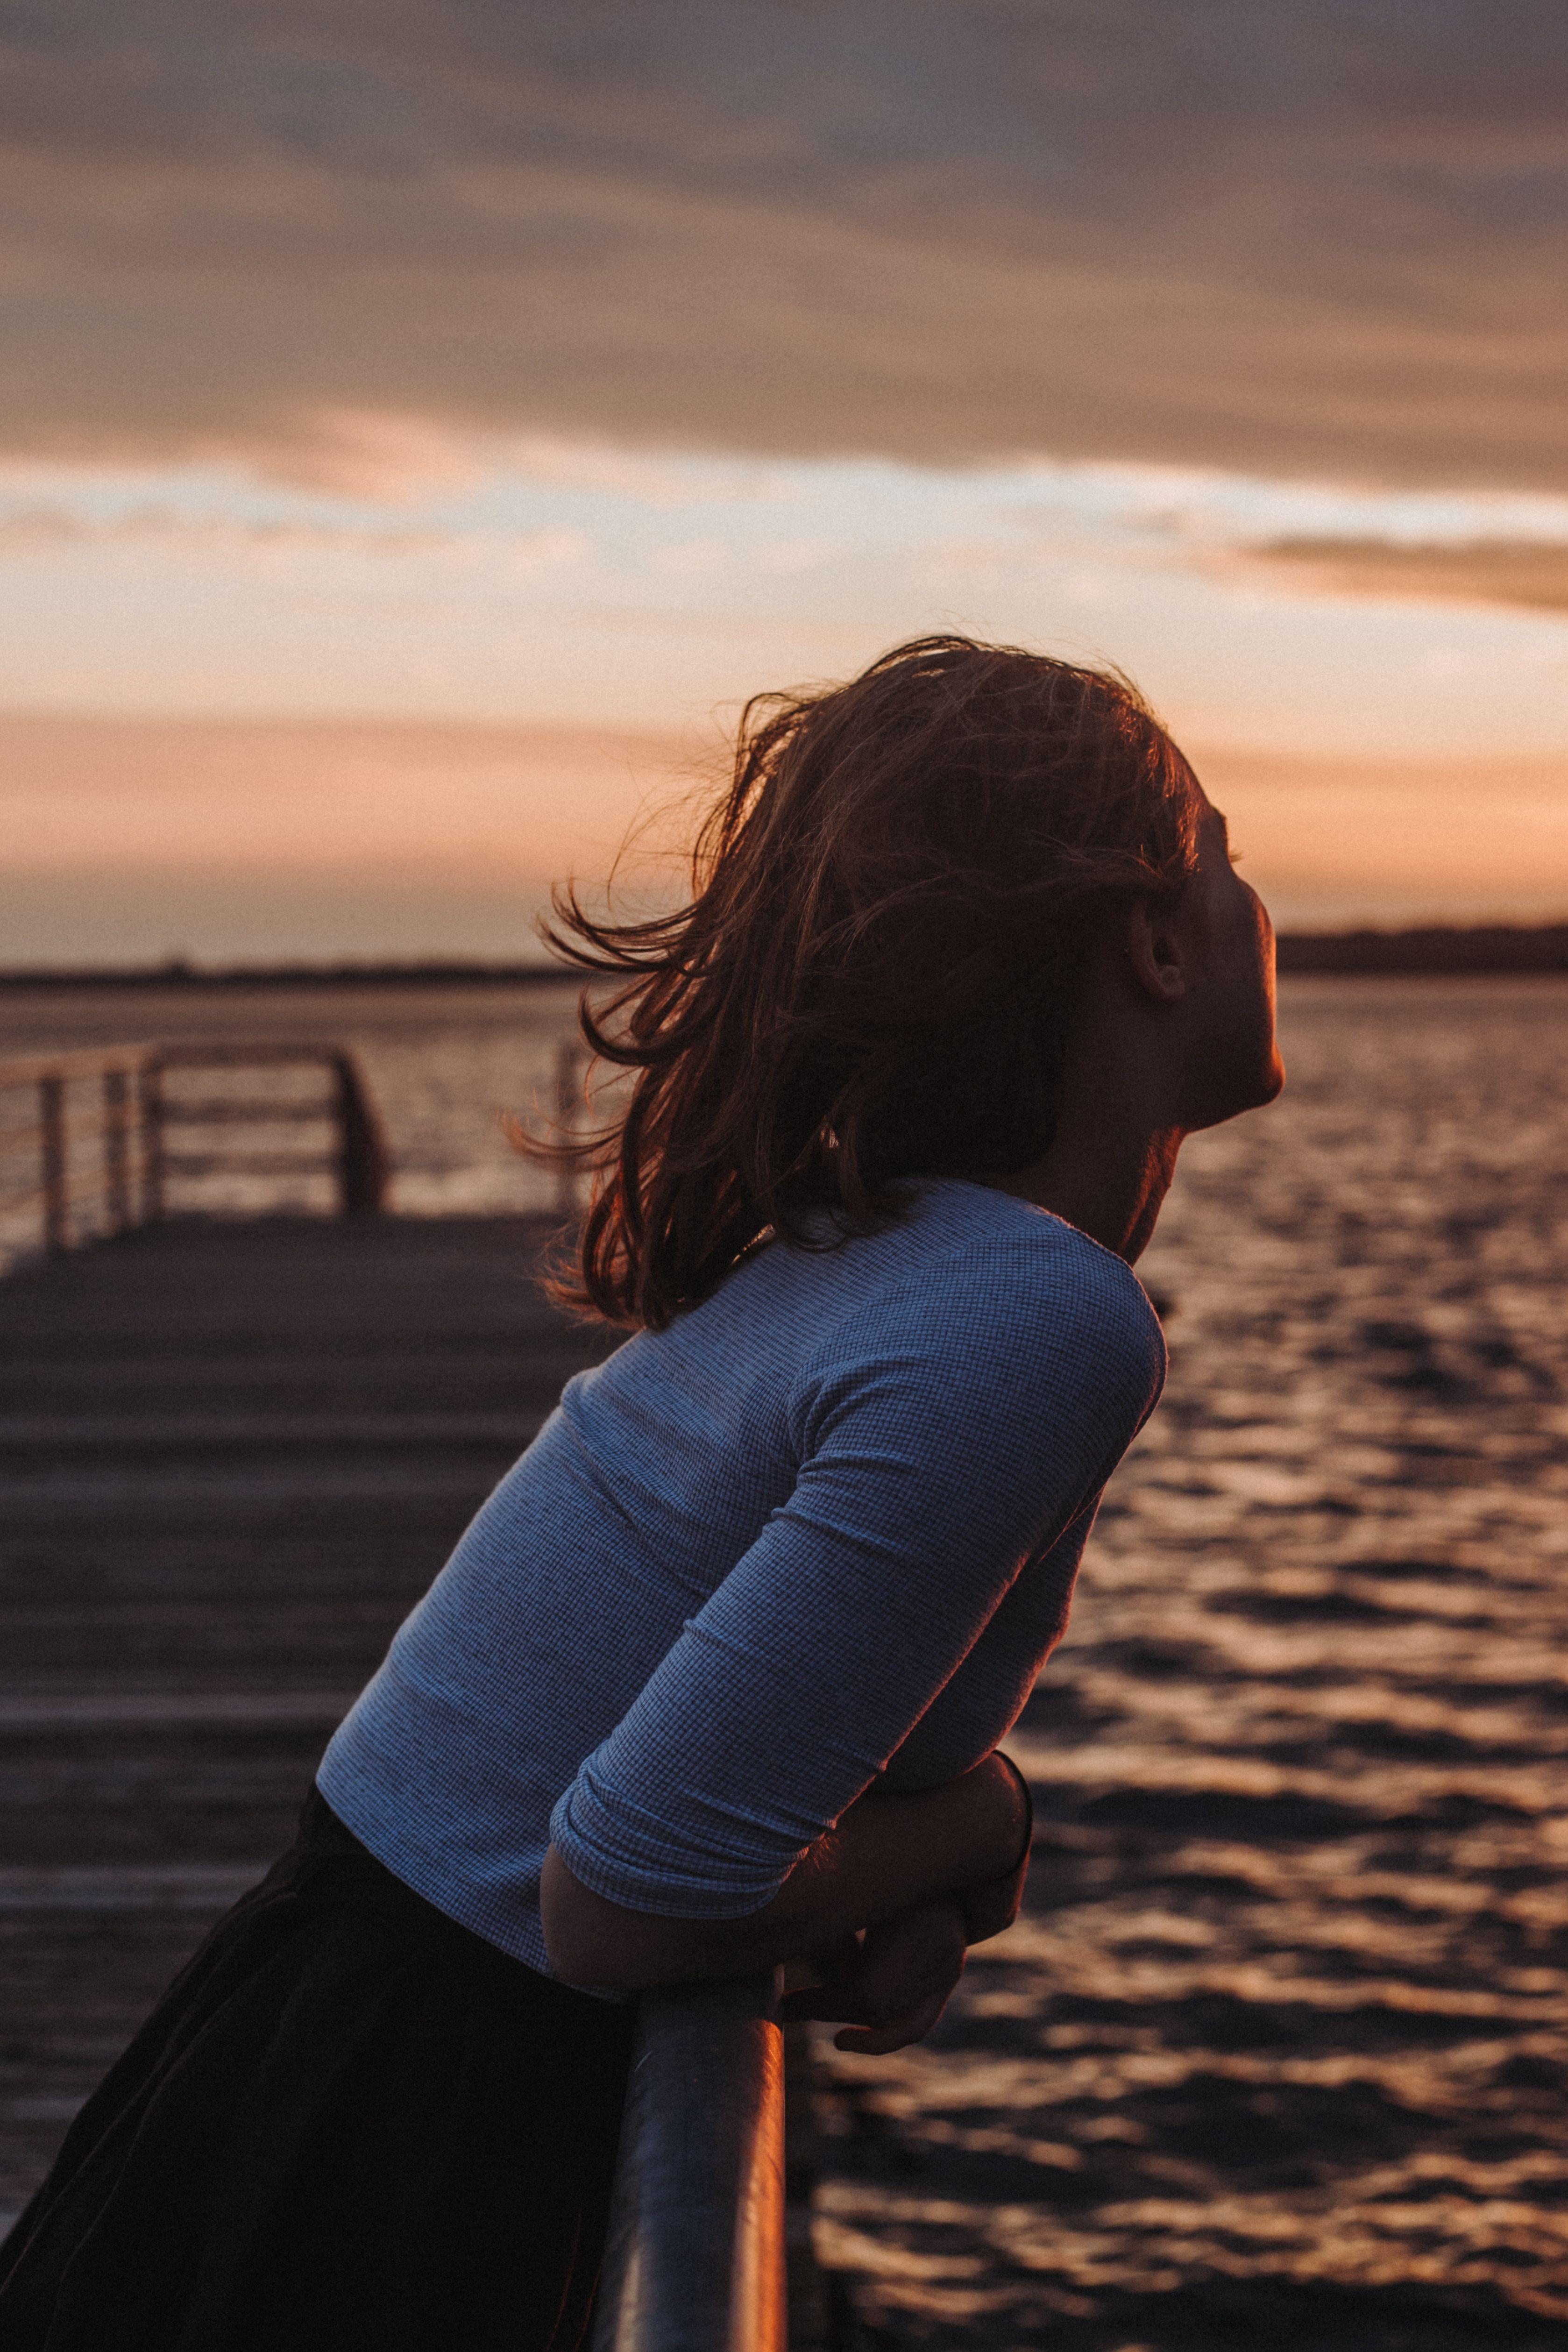 libertad | viendo el atardecer | océano | momento romántico | romantix urbano | Fitz …